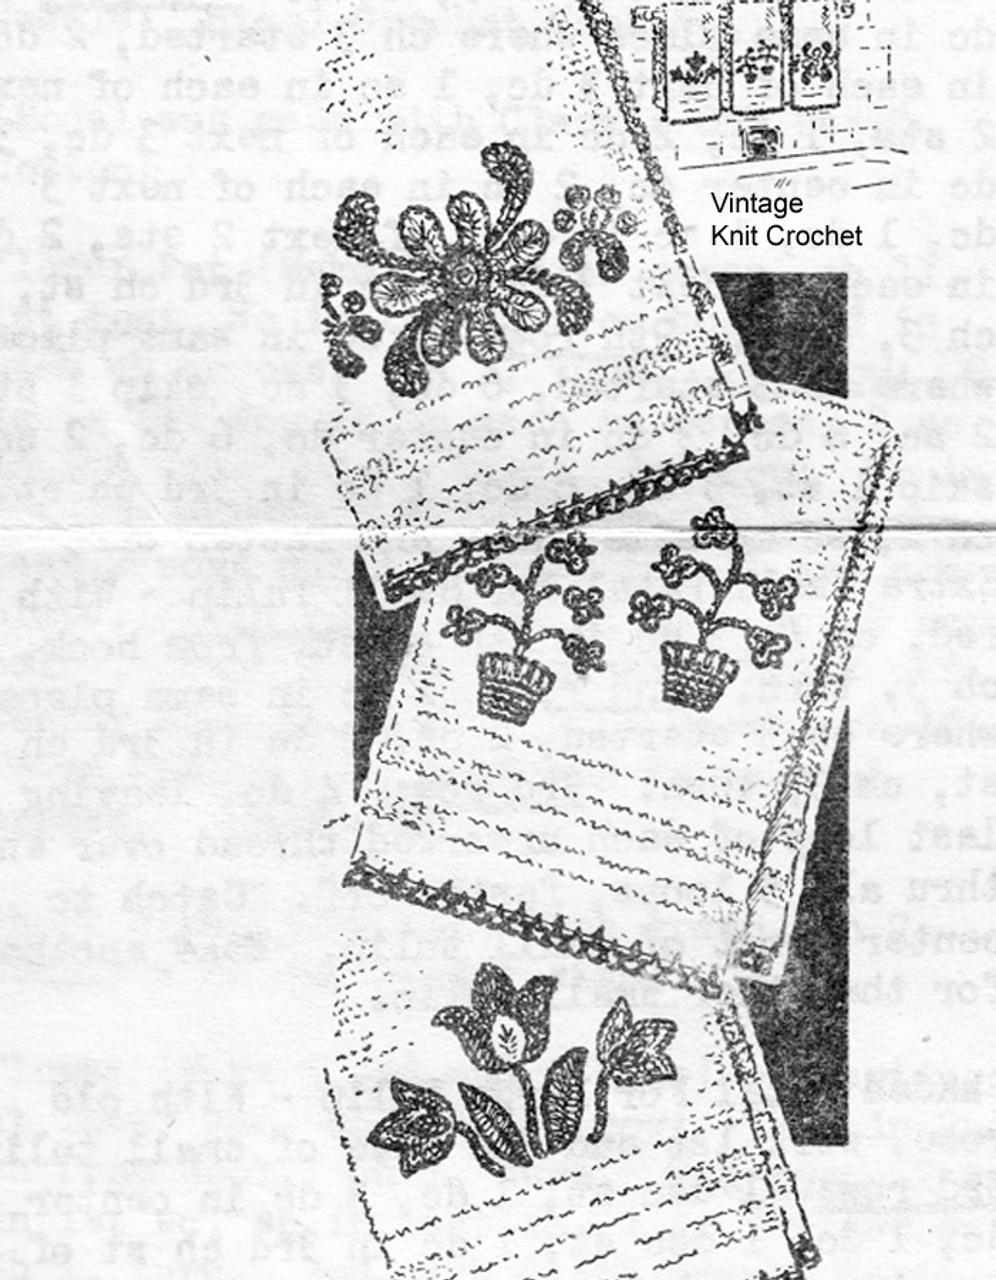 Vintage Flower Crochet Applique Edging Pattern, Anne Cabot 5879